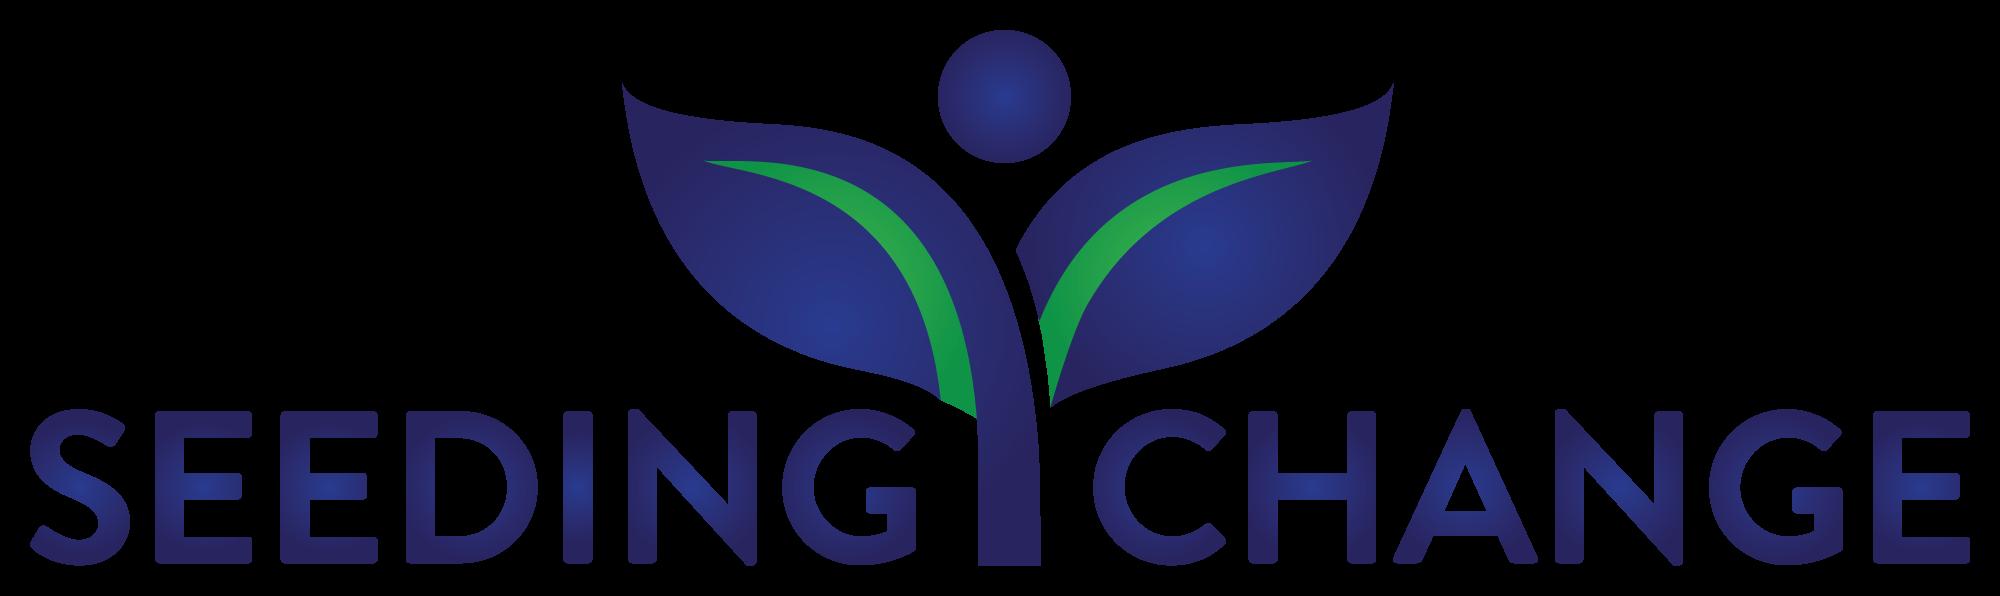 Home page of Seeding Change